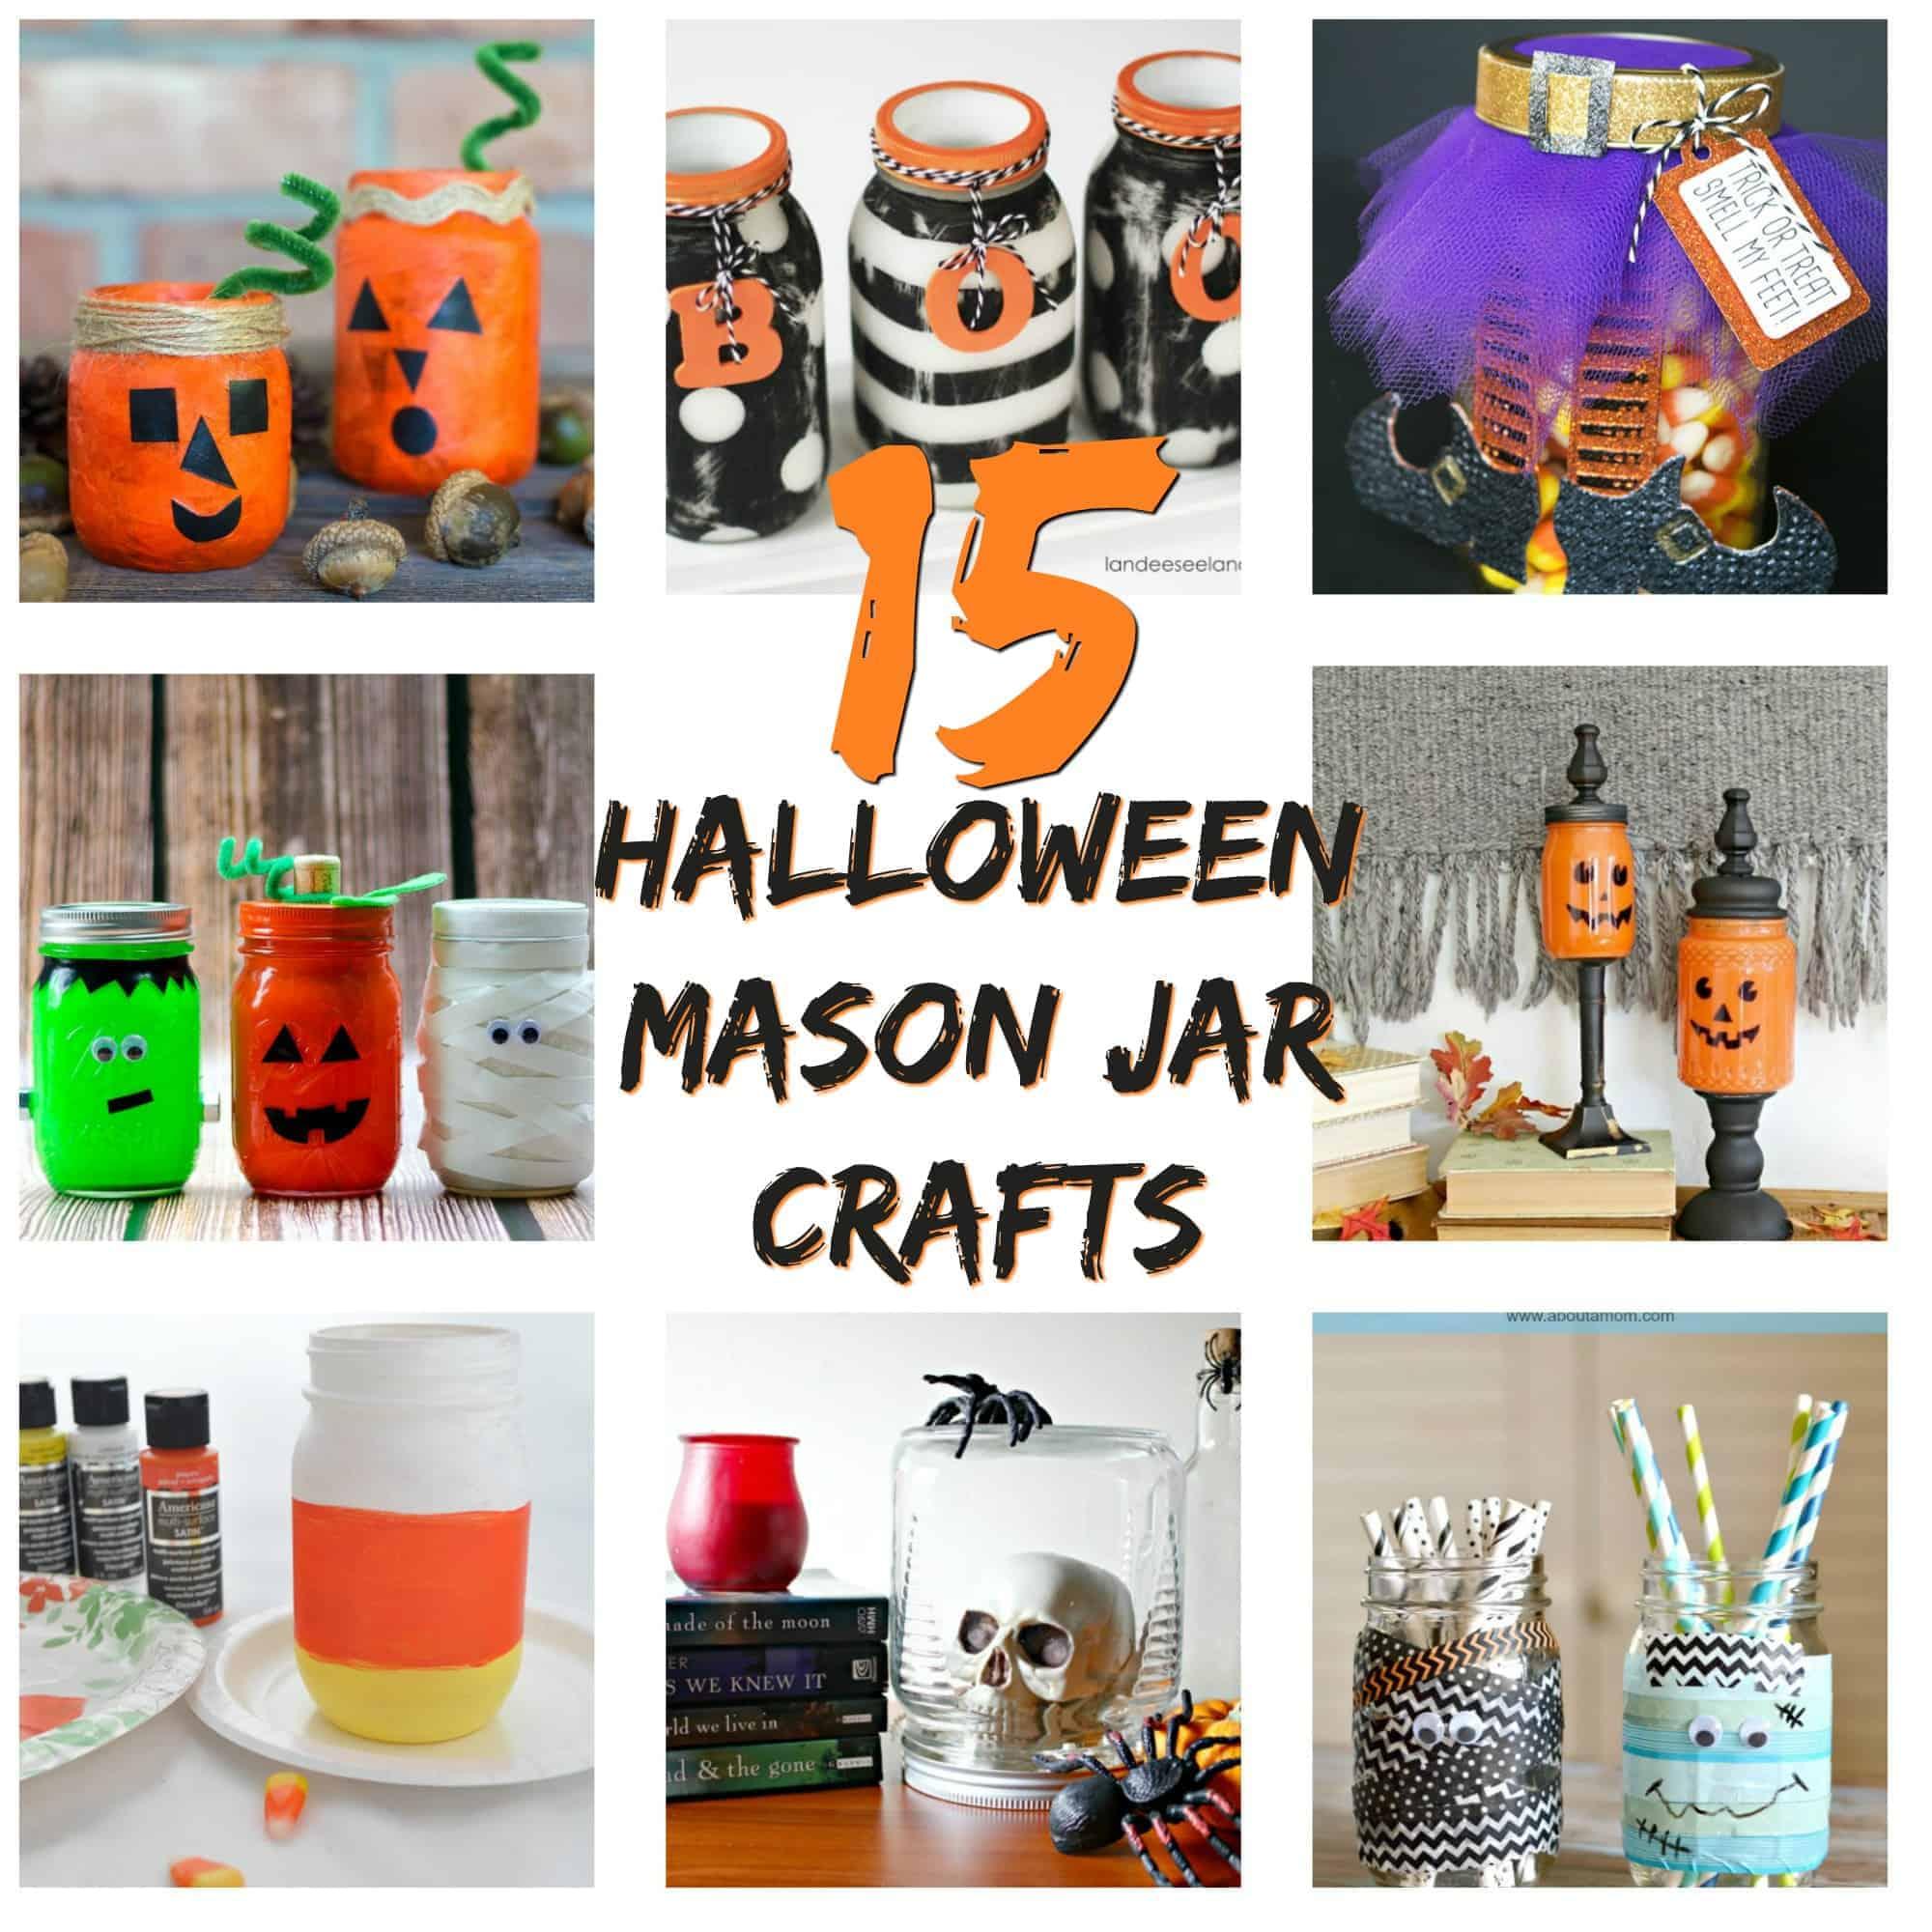 15 Diy Halloween Mason Jar Crafts The Happy Home Life